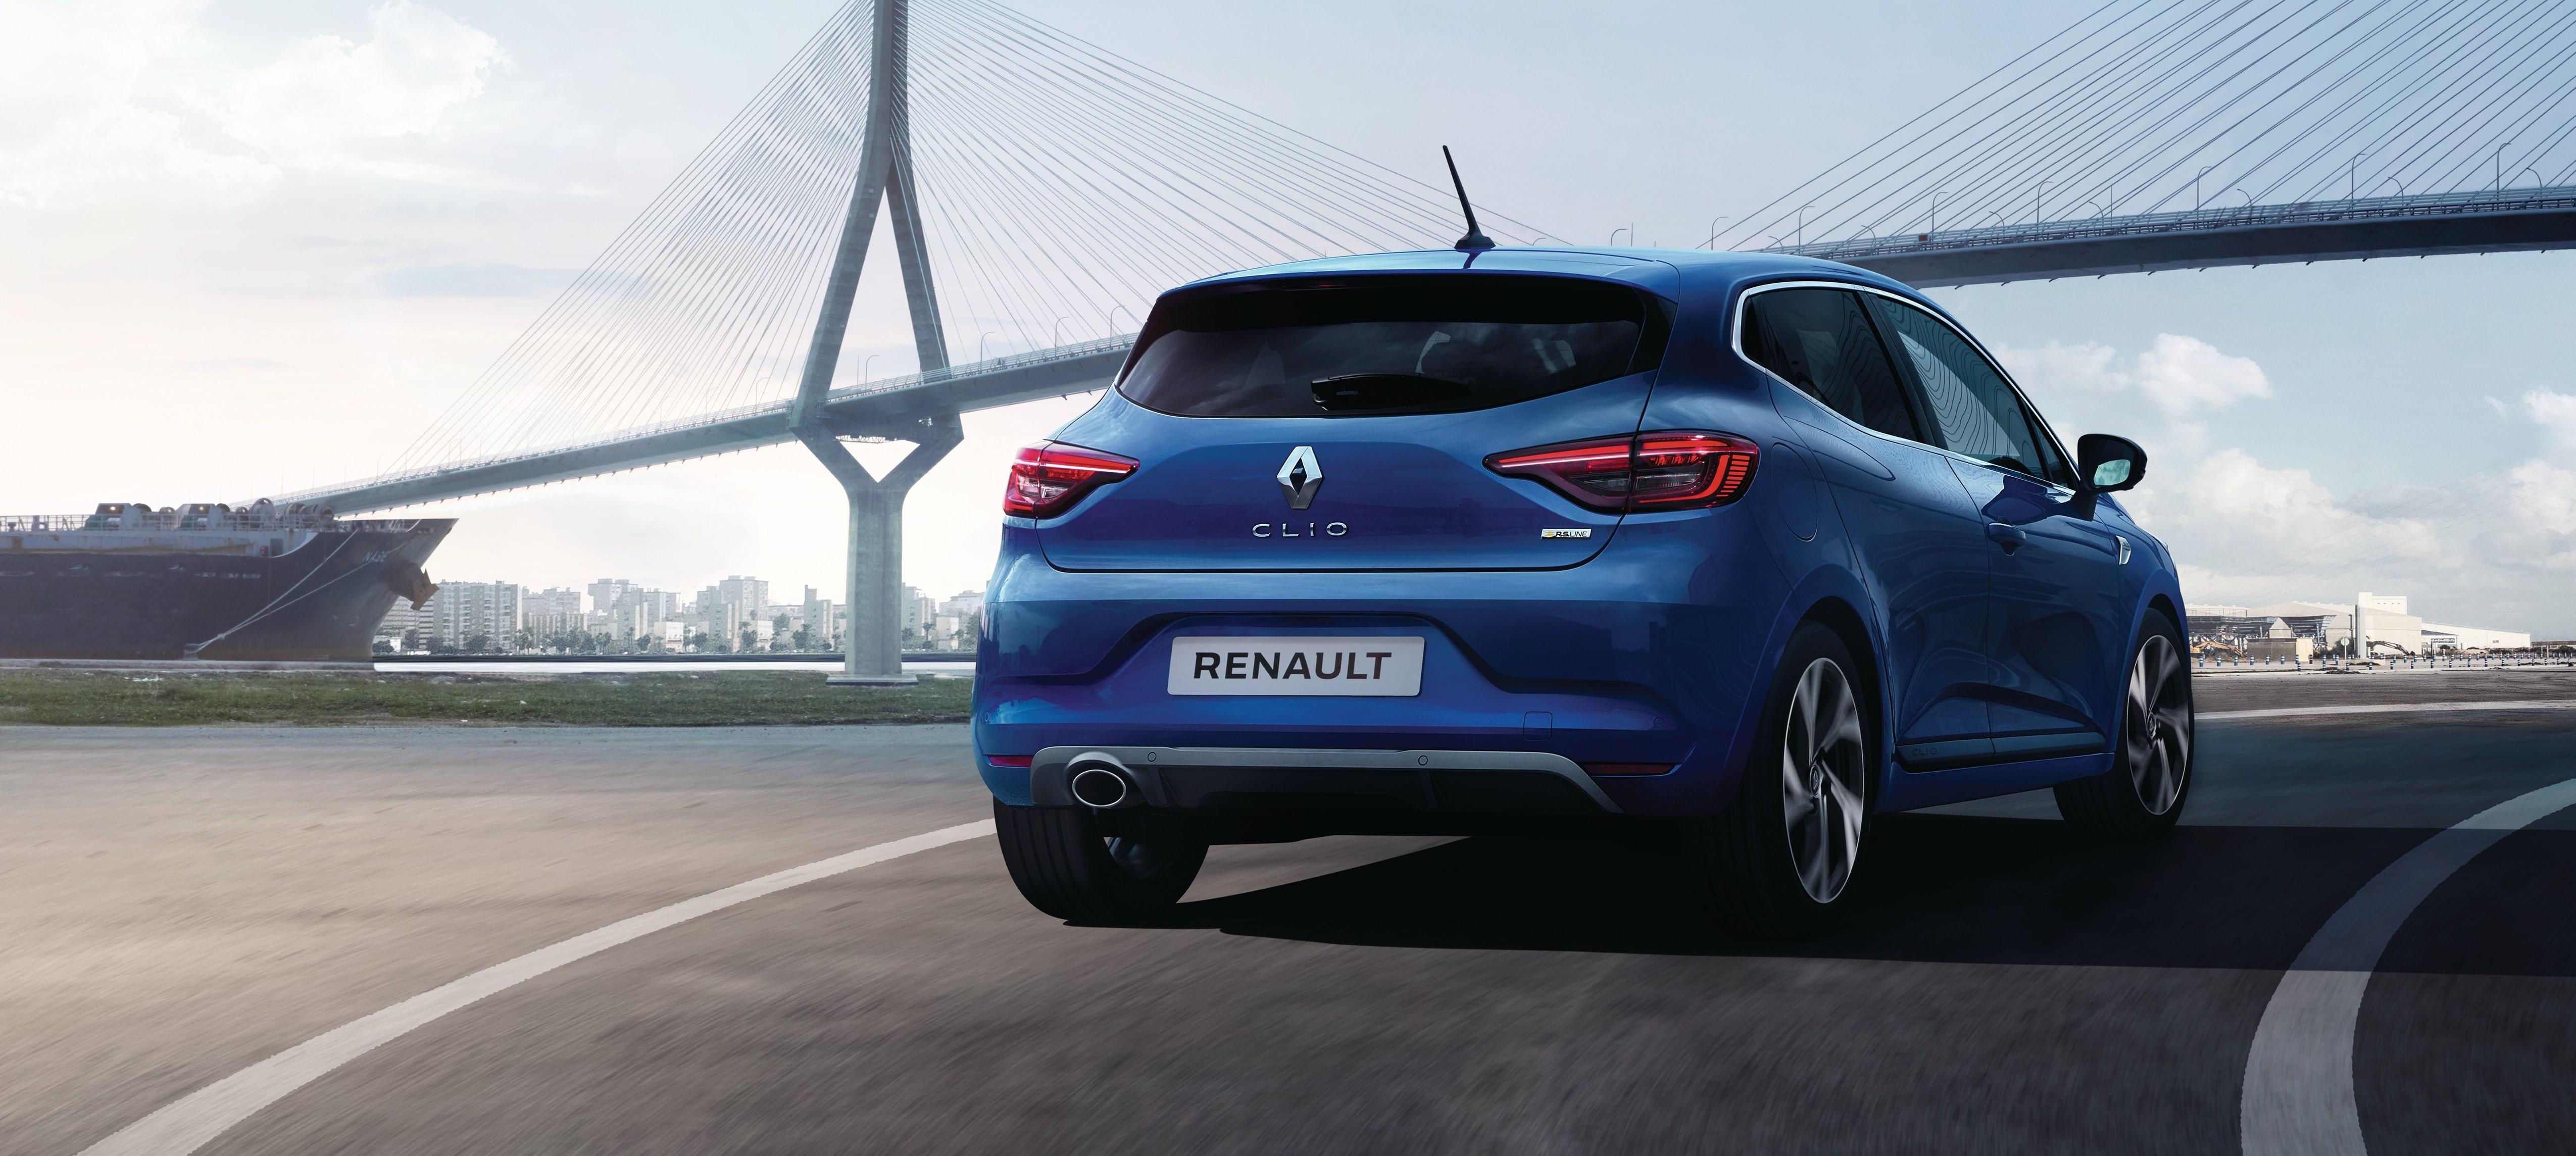 Renault Df1020